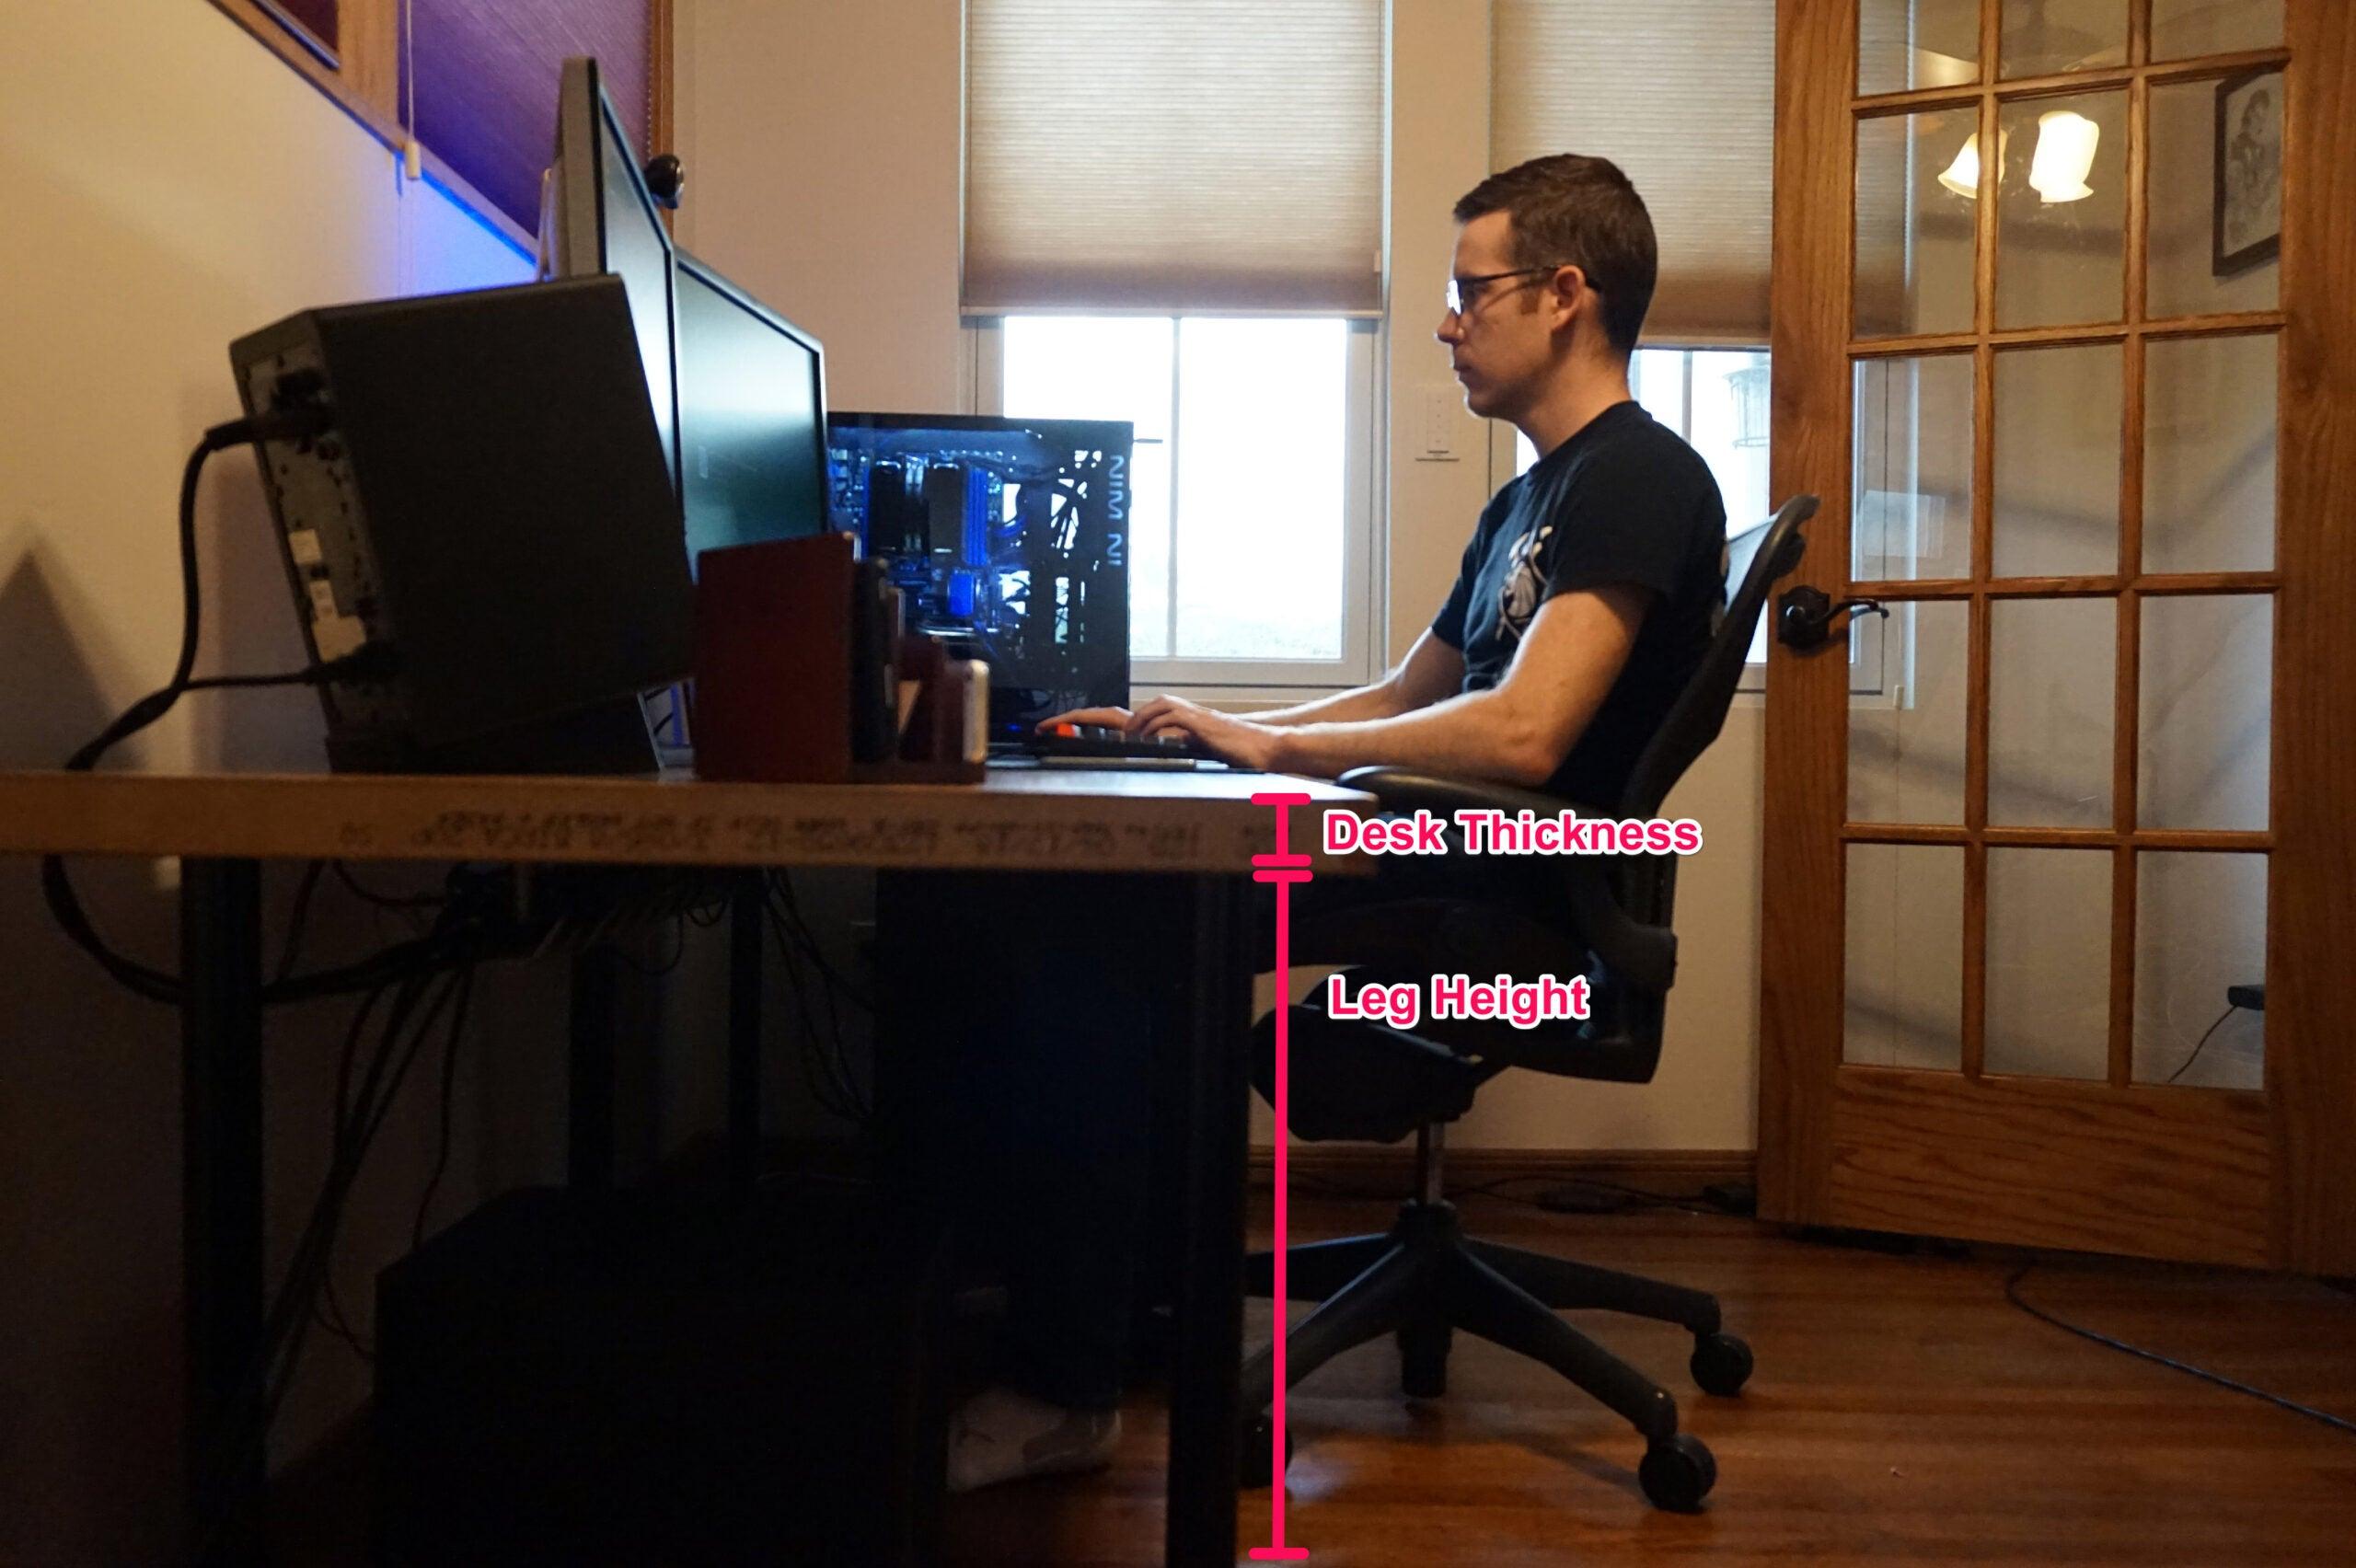 Step 2 - Plan the ergonomics